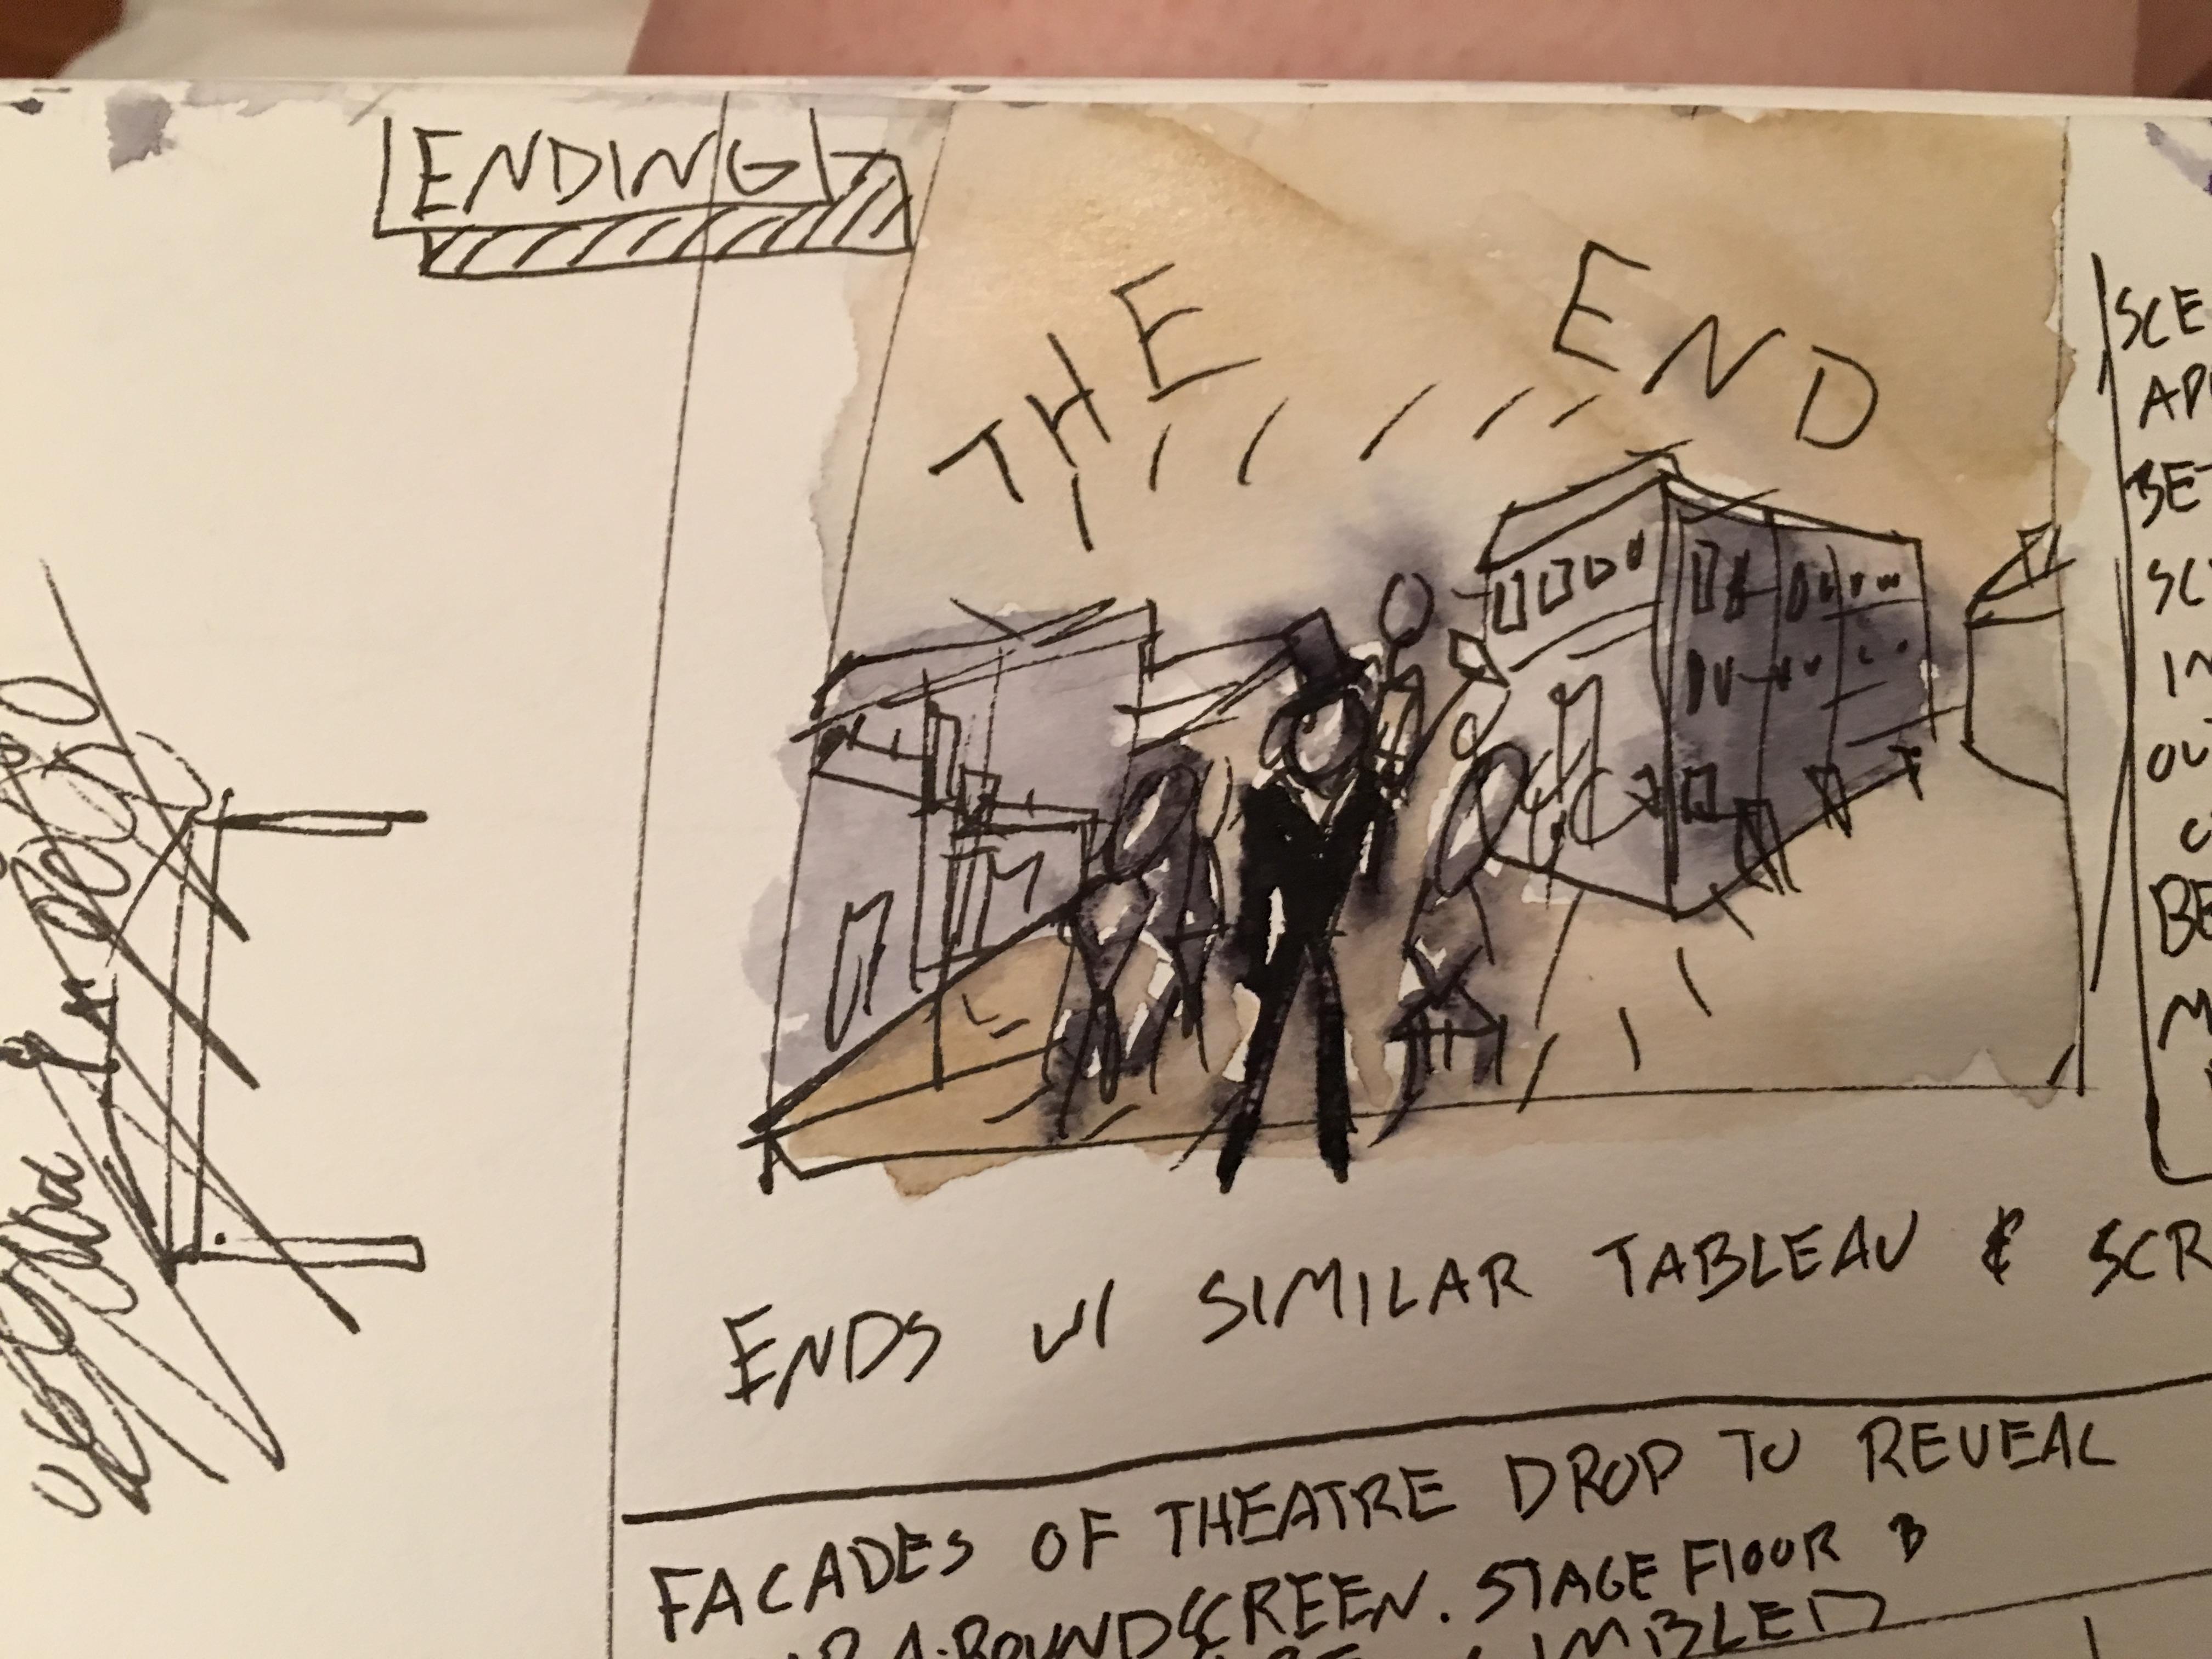 End Curtain/Scene 2